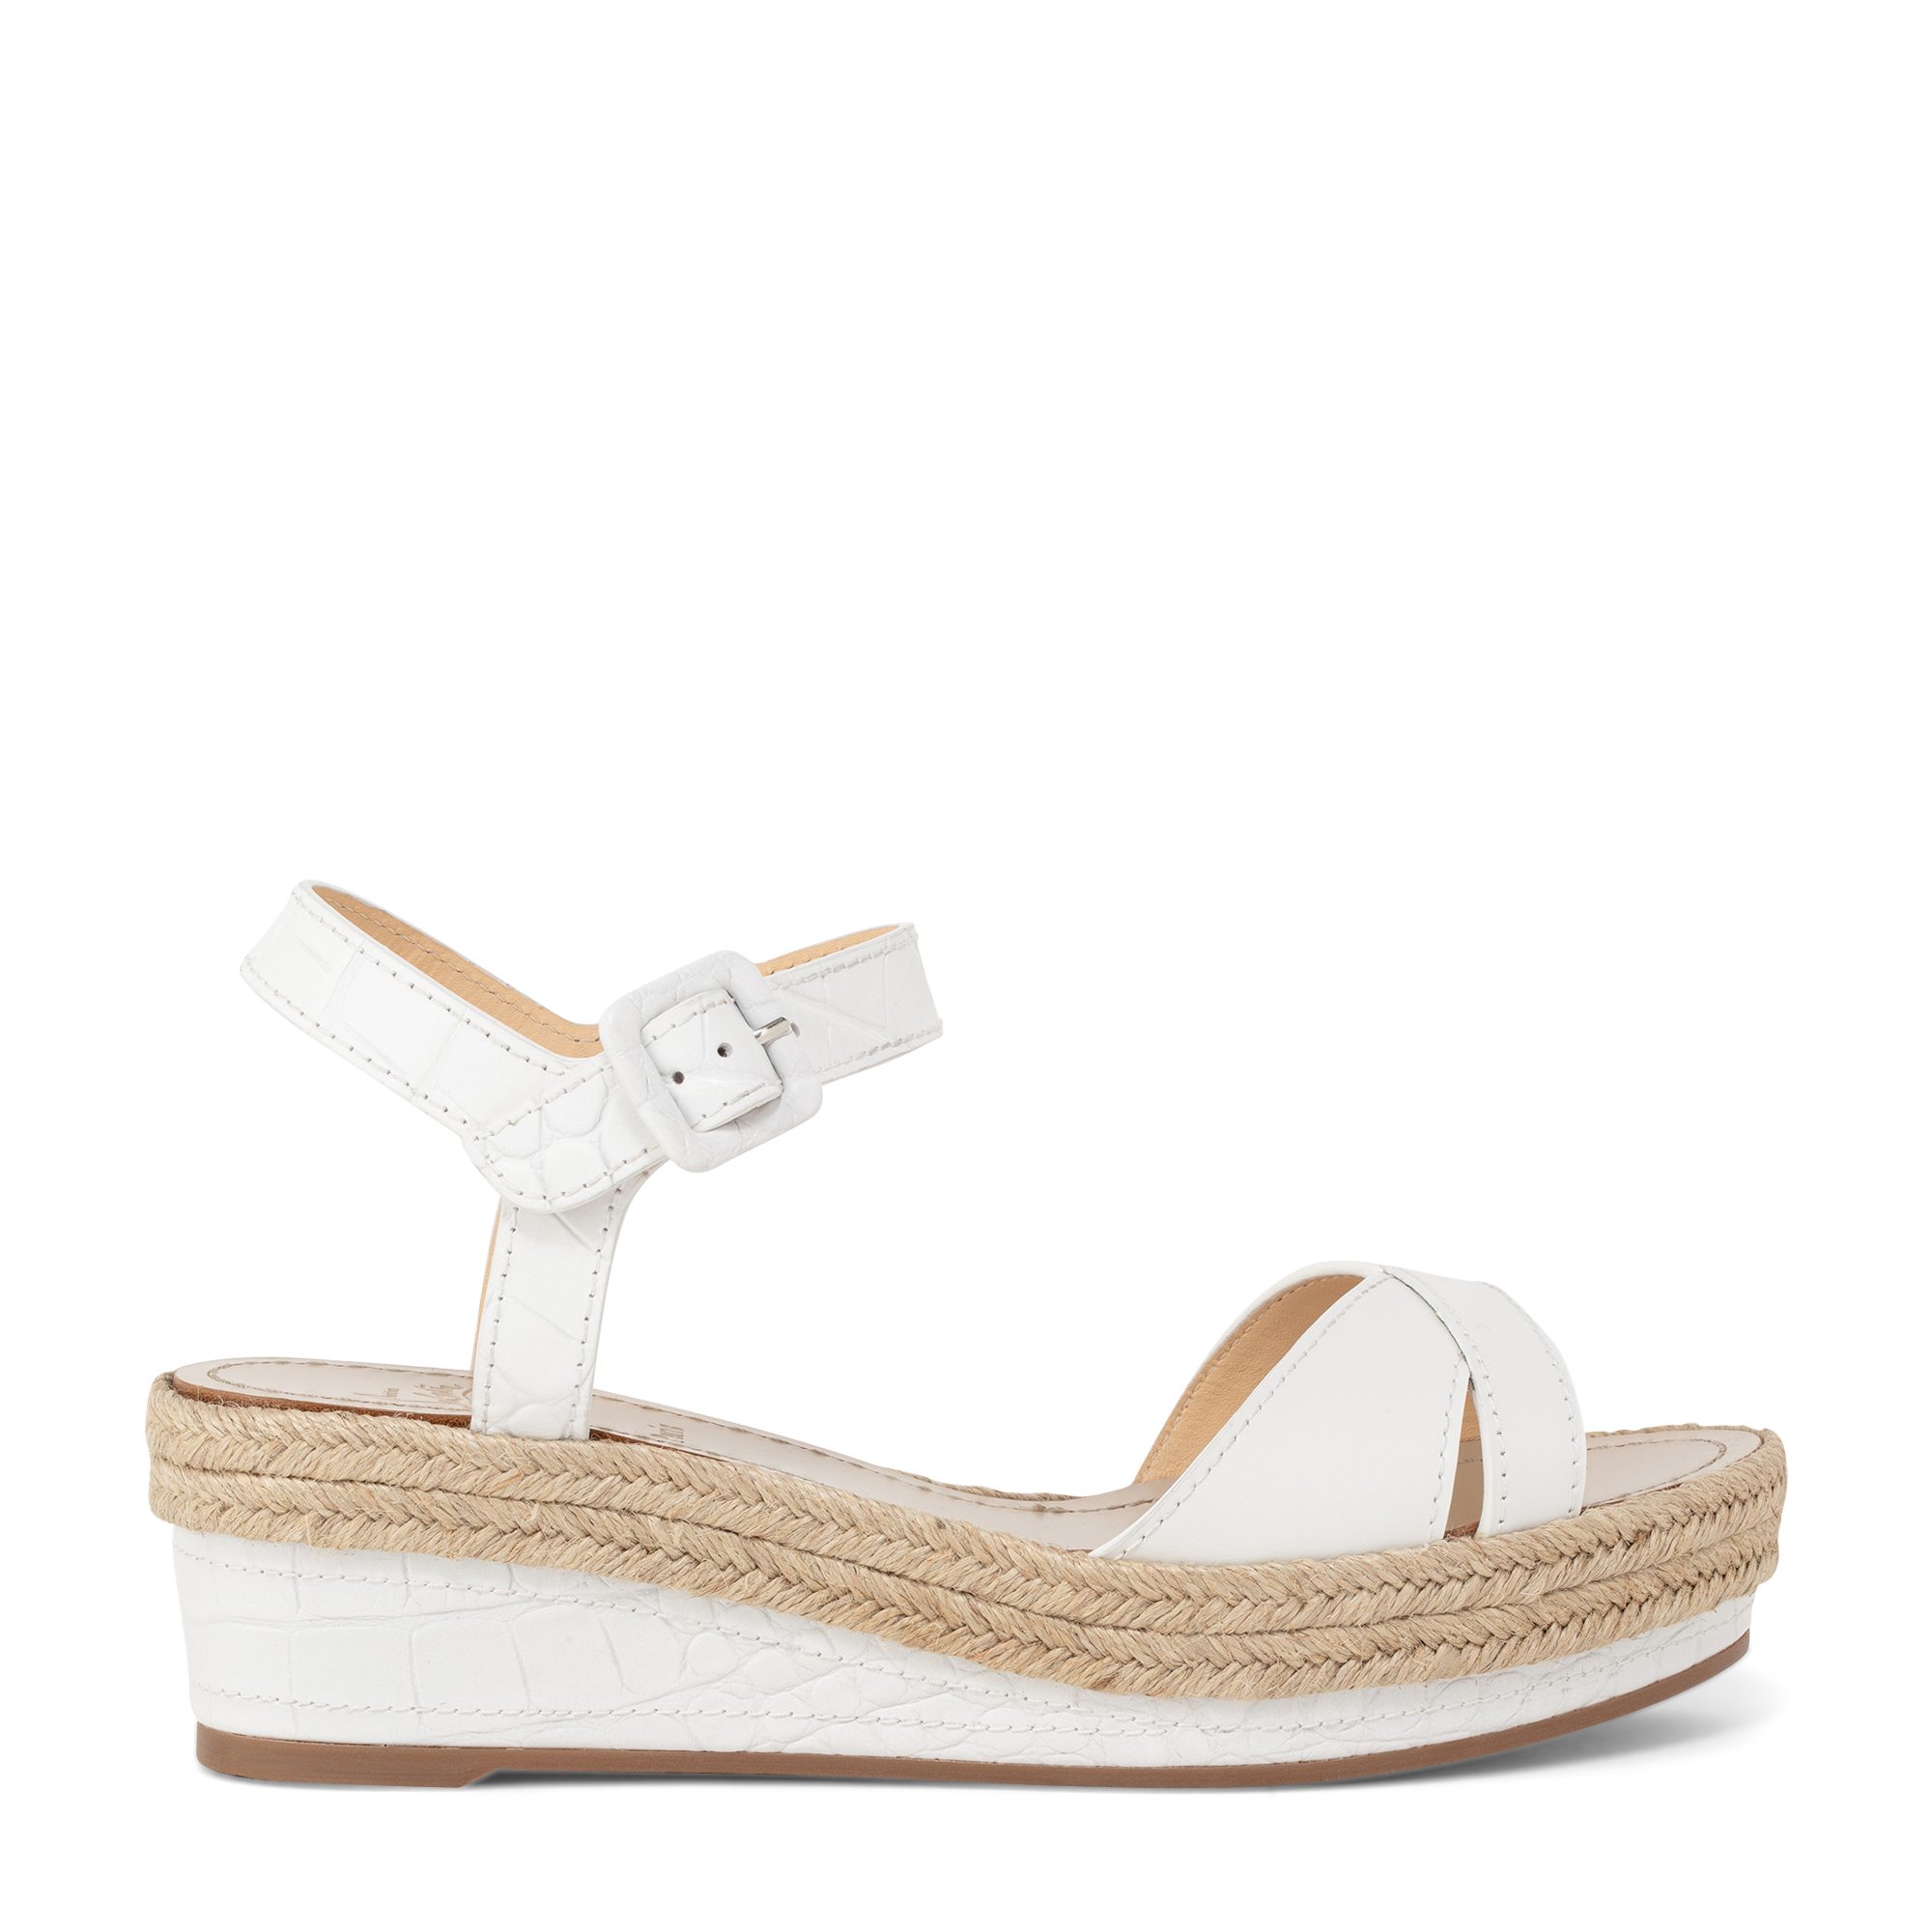 Almerio 60 sandals